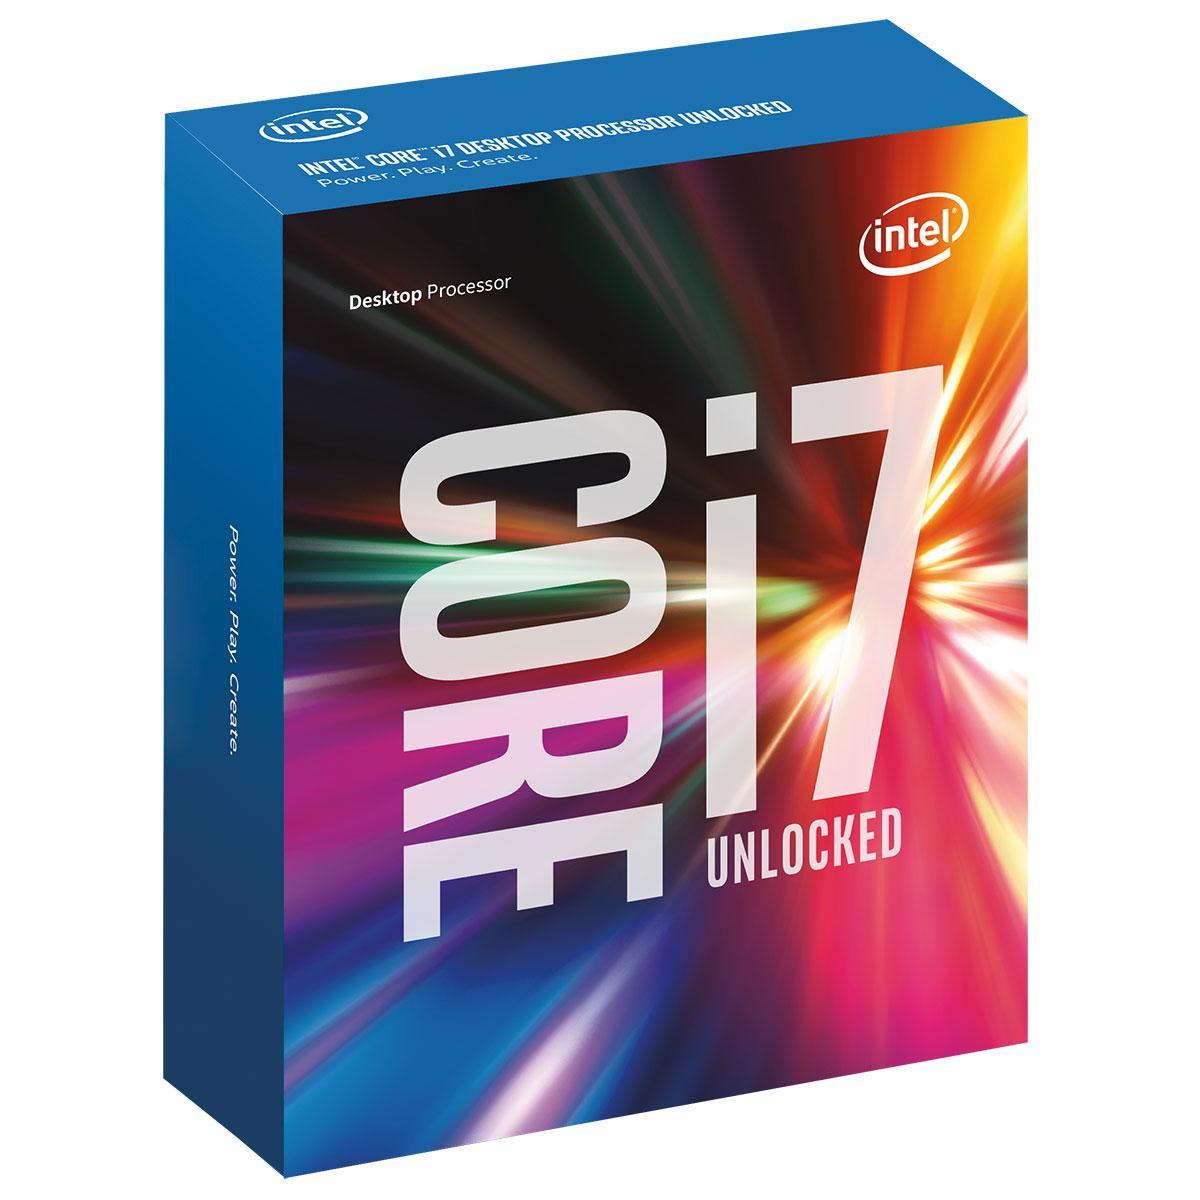 Processeur Intel Core i7-6700K (4.0 GHz)